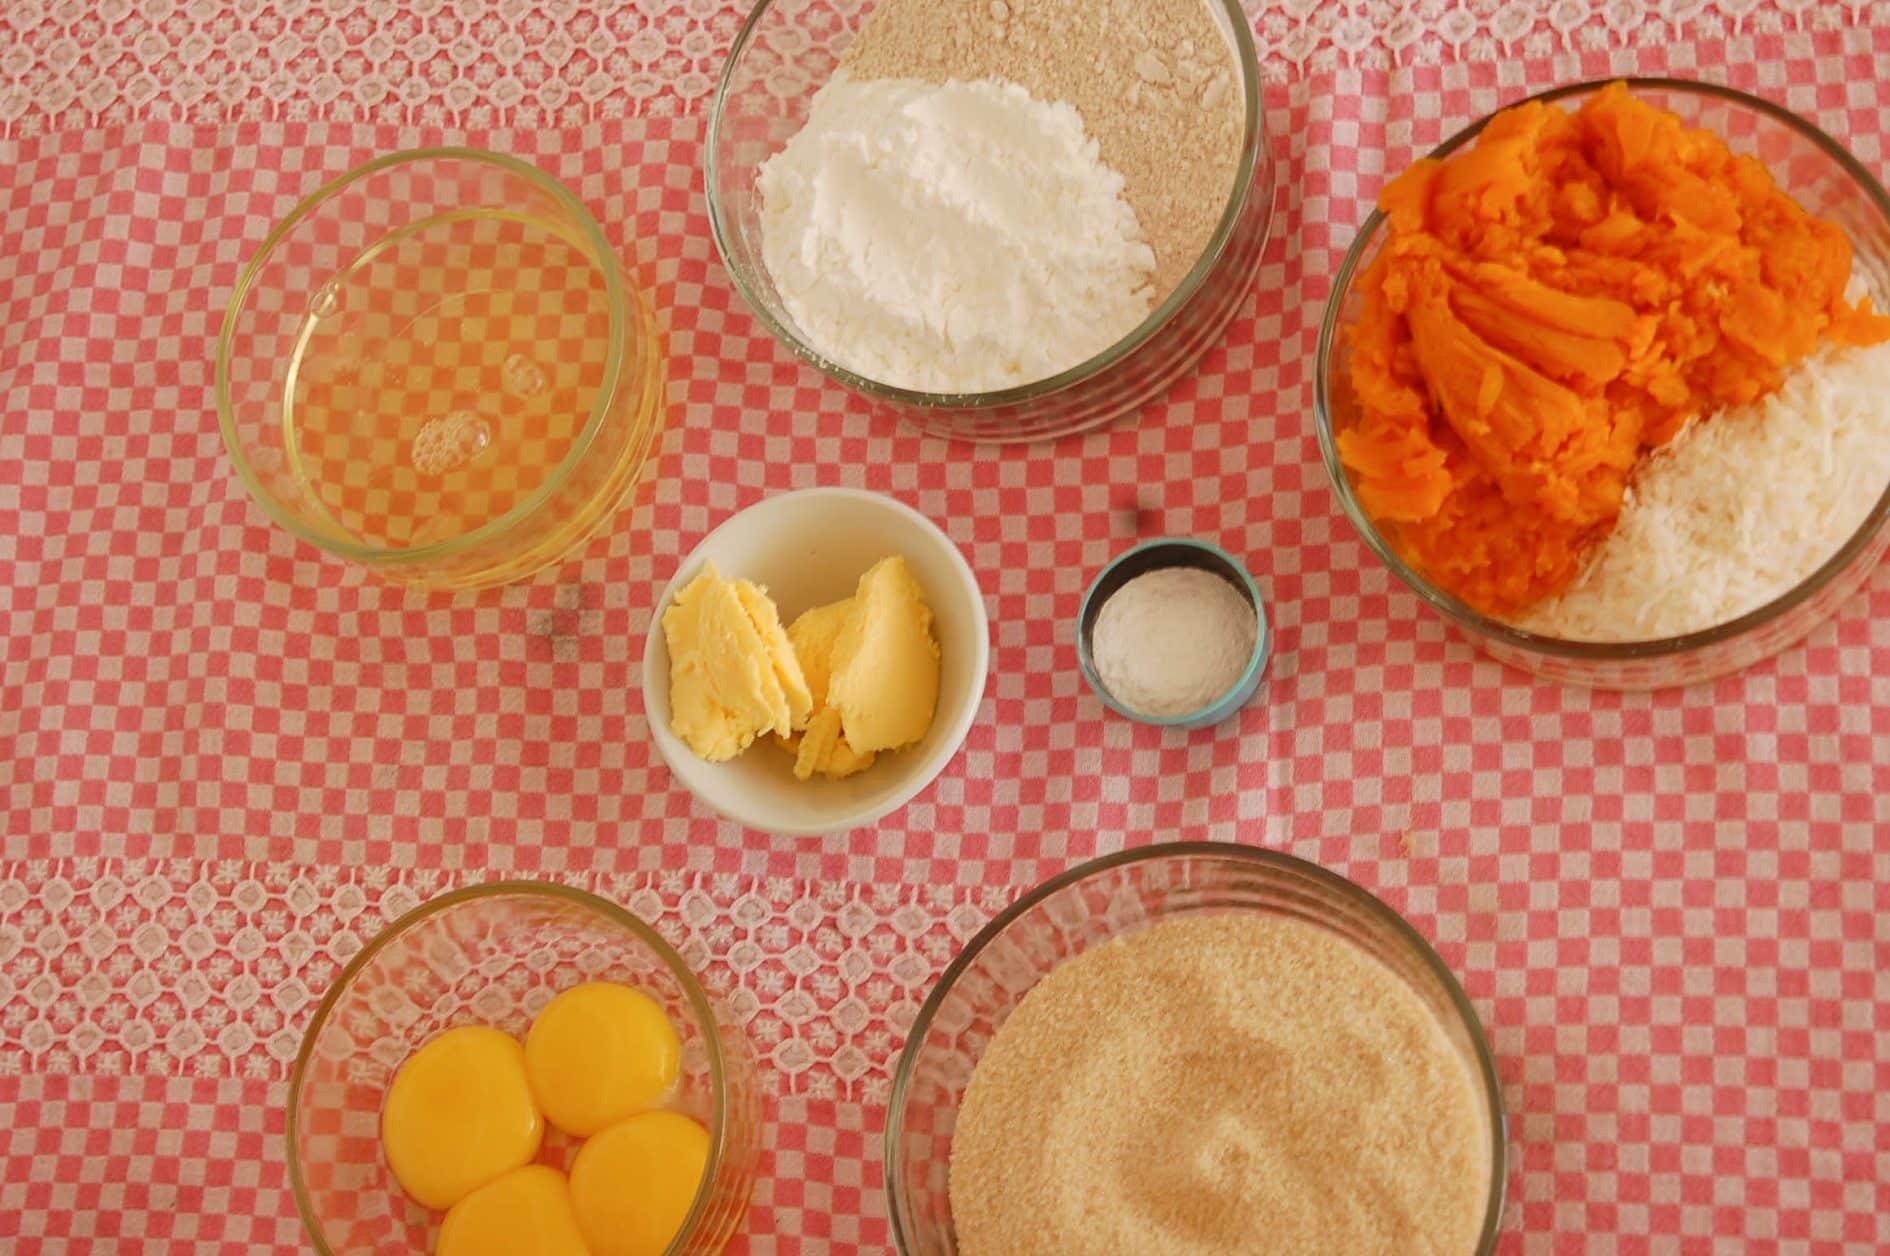 Ingredientes Bolo Integral de Abobora com Coco